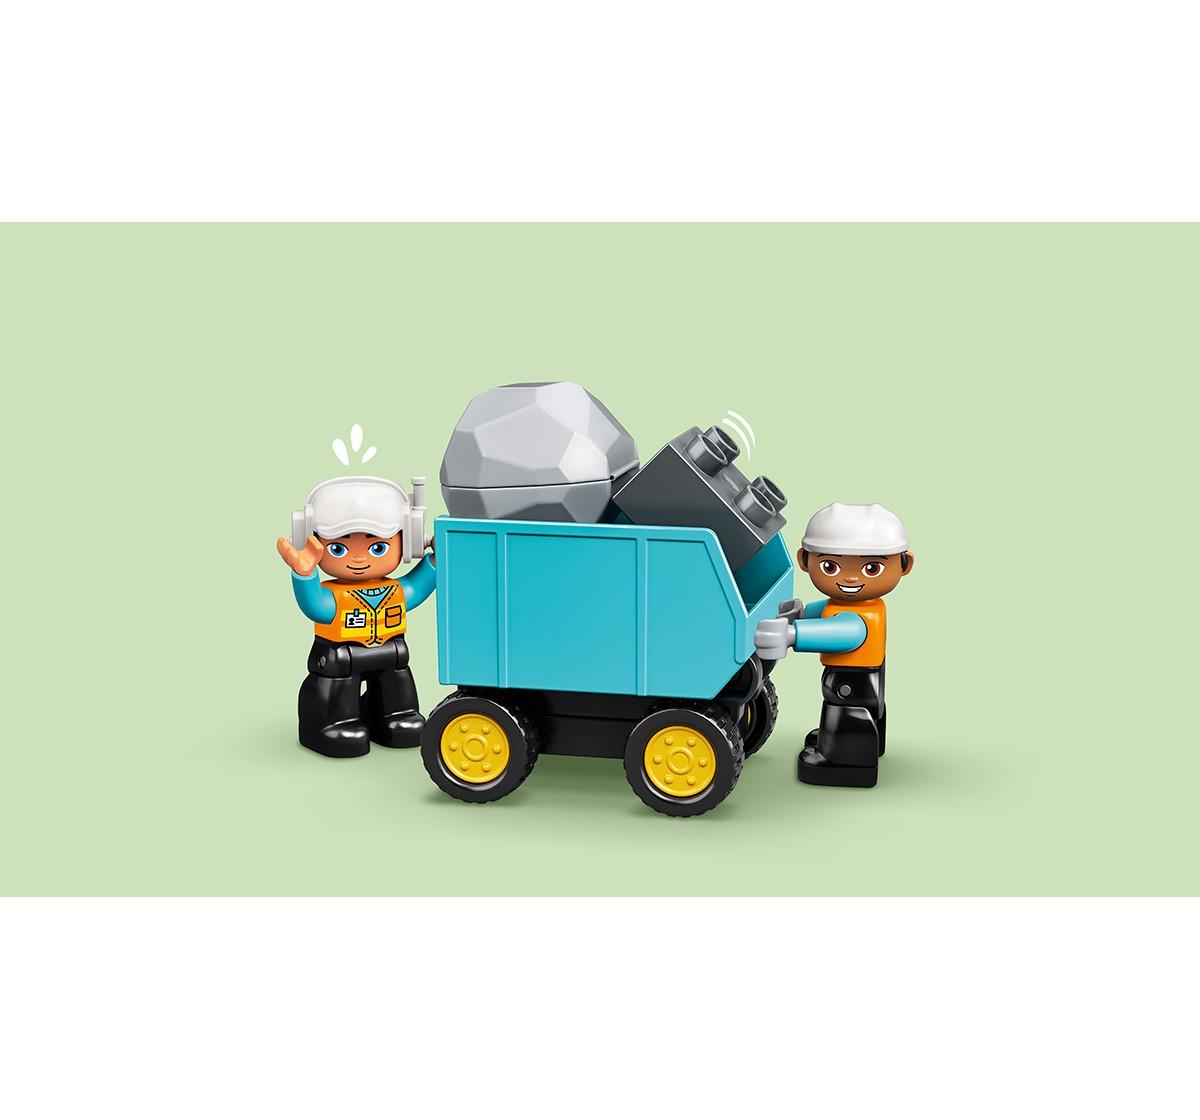 LEGO 10931 Truck & Tracked Excavator Lego Blocks for Kids age 2Y+